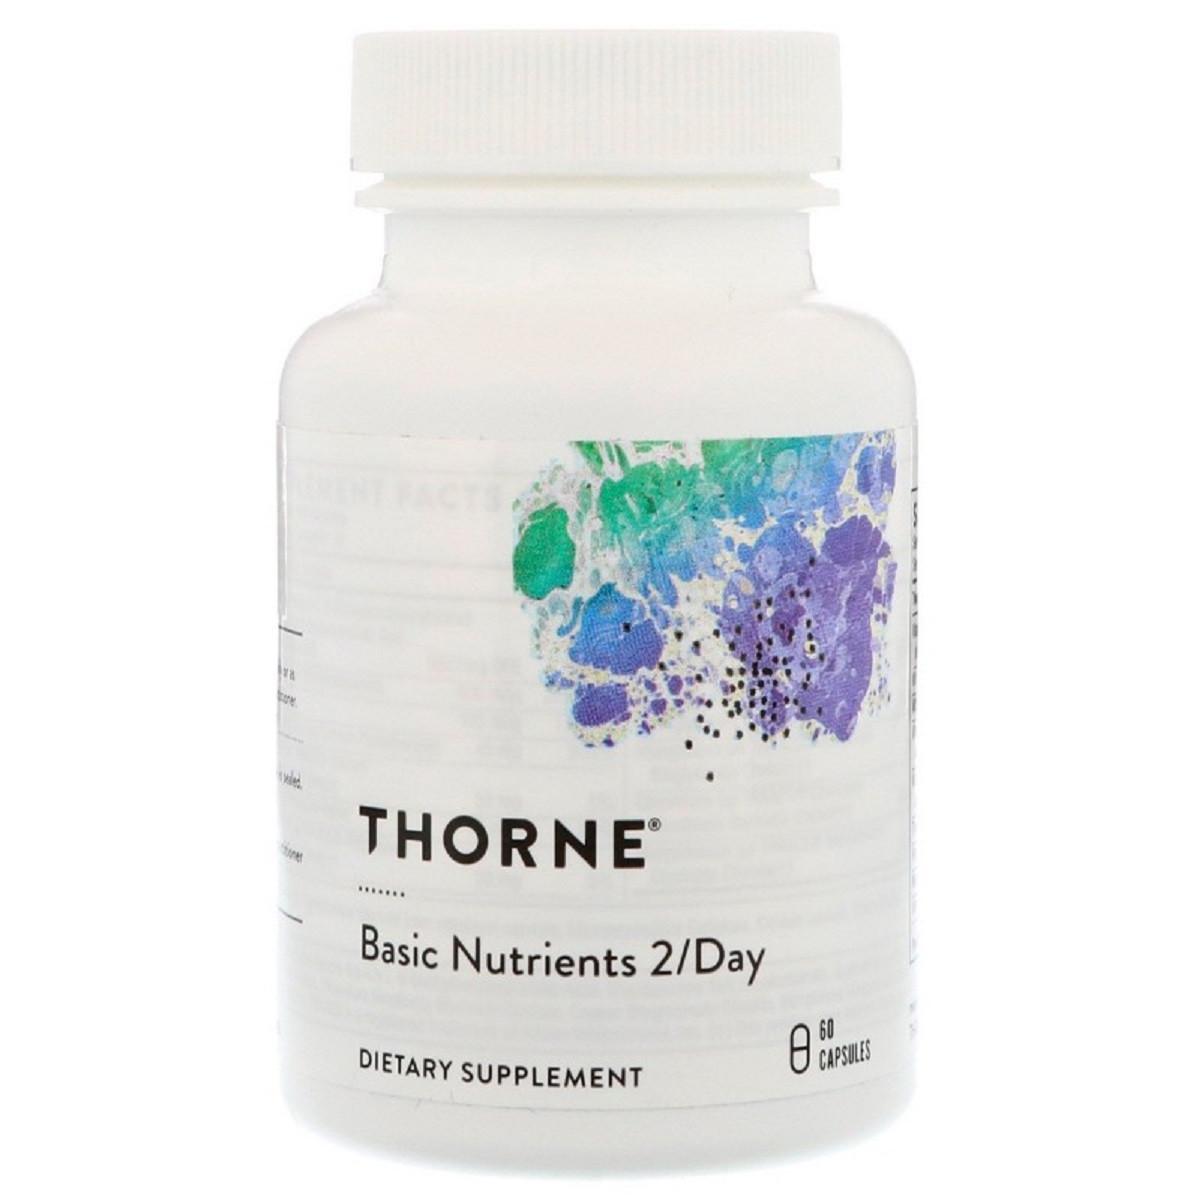 Базовые Питательные Вещества, Basic Nutrients 2/Day, Thorne Research, 60 Капсул